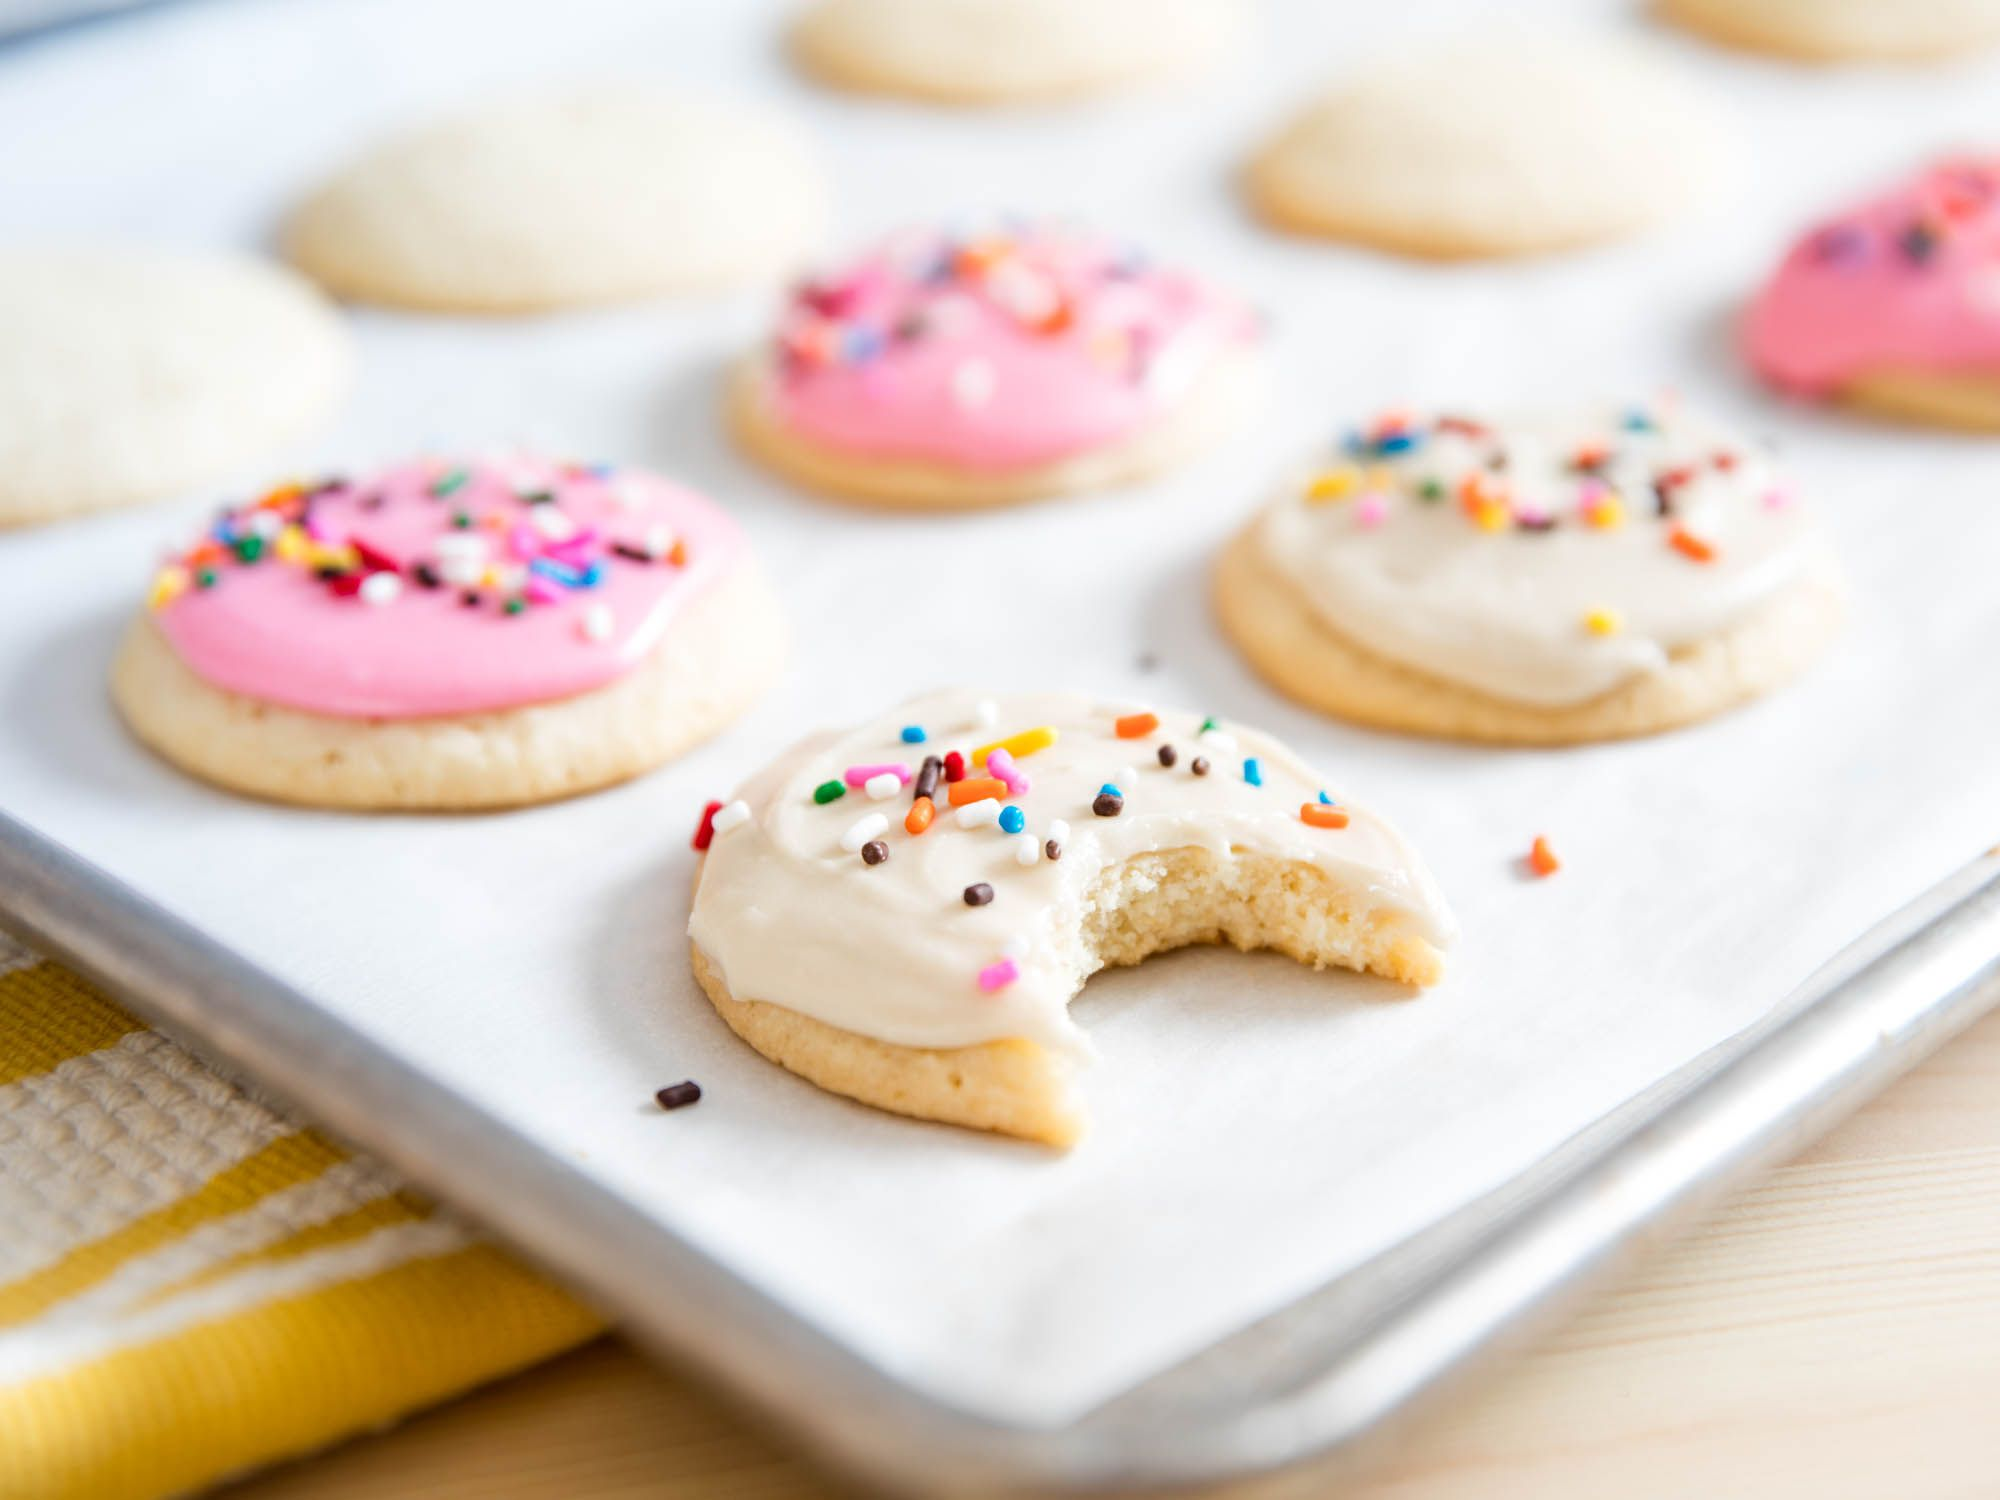 20160610-lofthouse-cookies-vicky-wasik-4.jpg